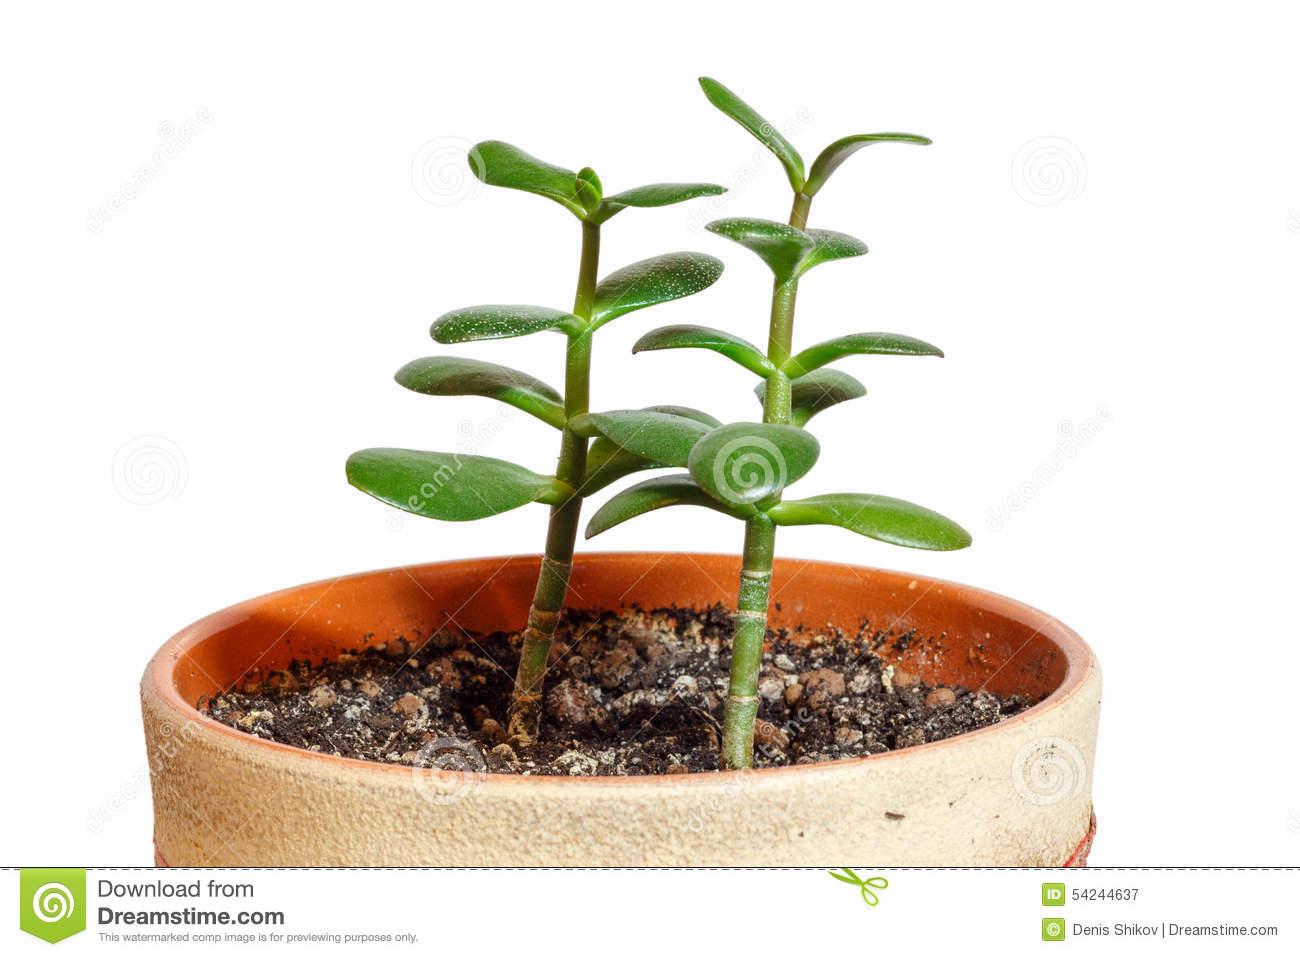 Crassula Ovata Or Jade Plant In Flower Pot Stock Photo.